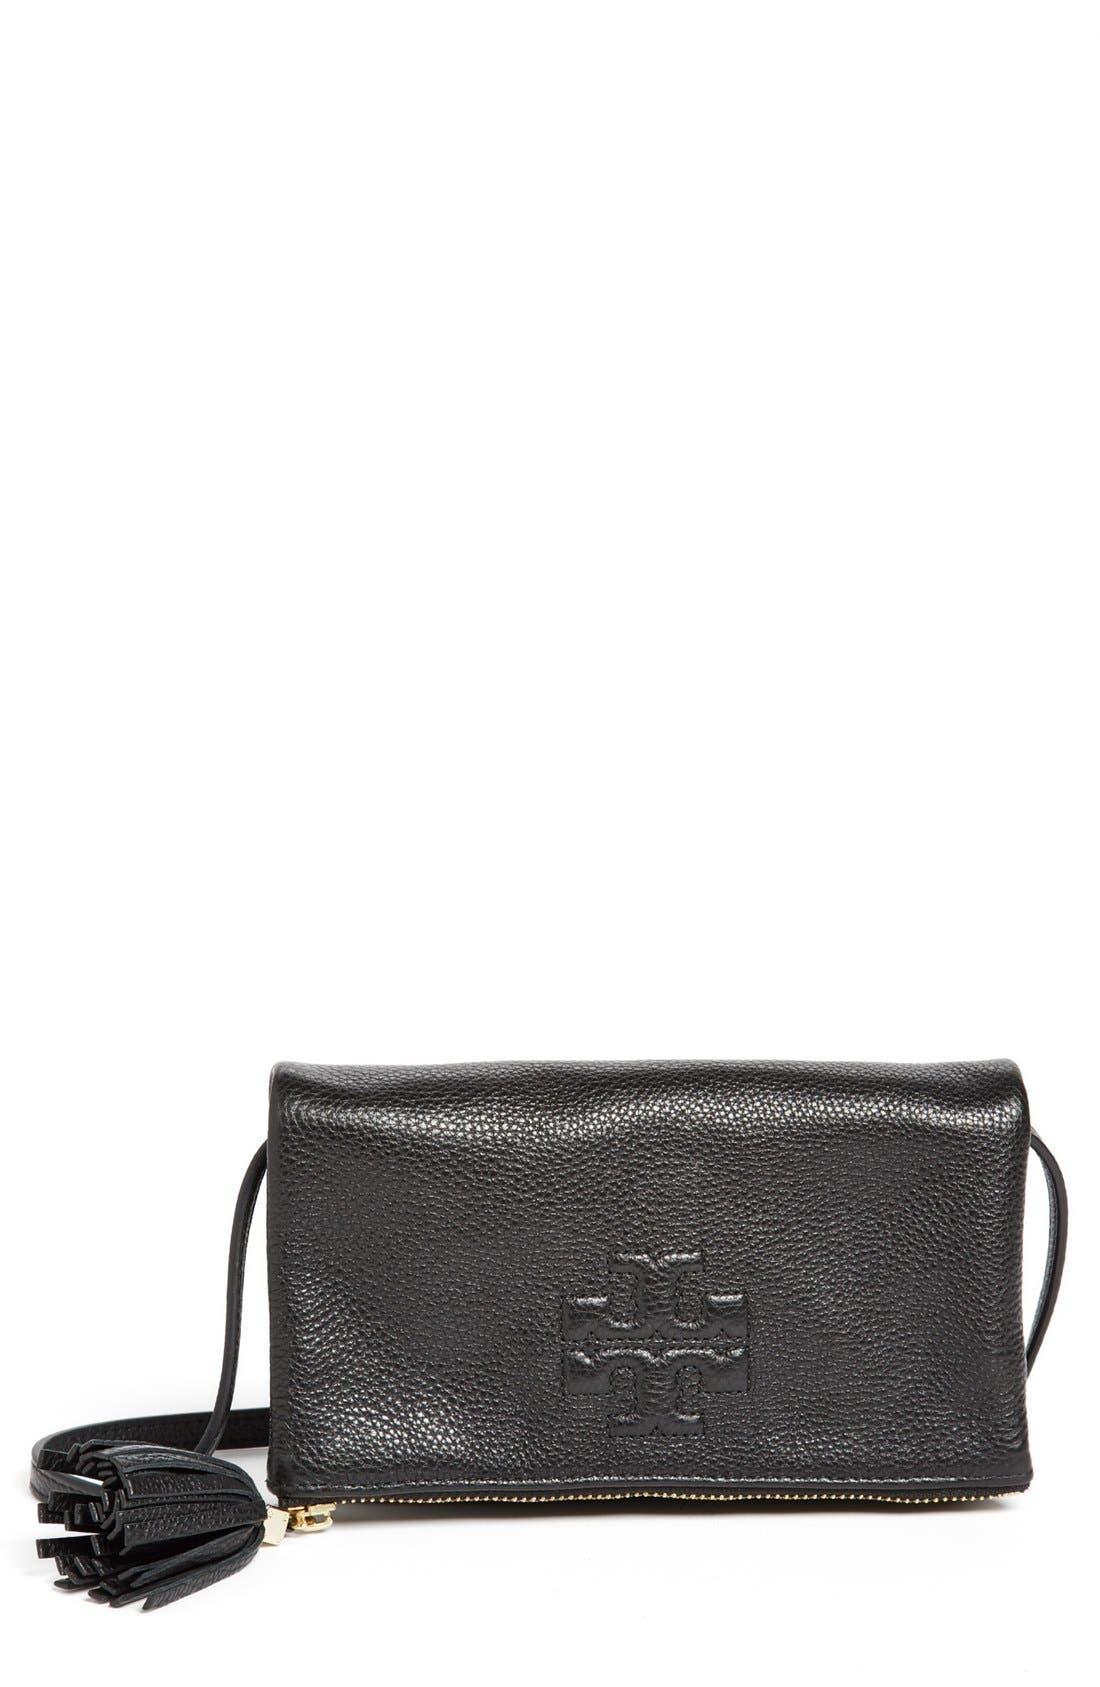 Main Image - Tory Burch 'Thea - Mini' Foldover Crossbody Bag